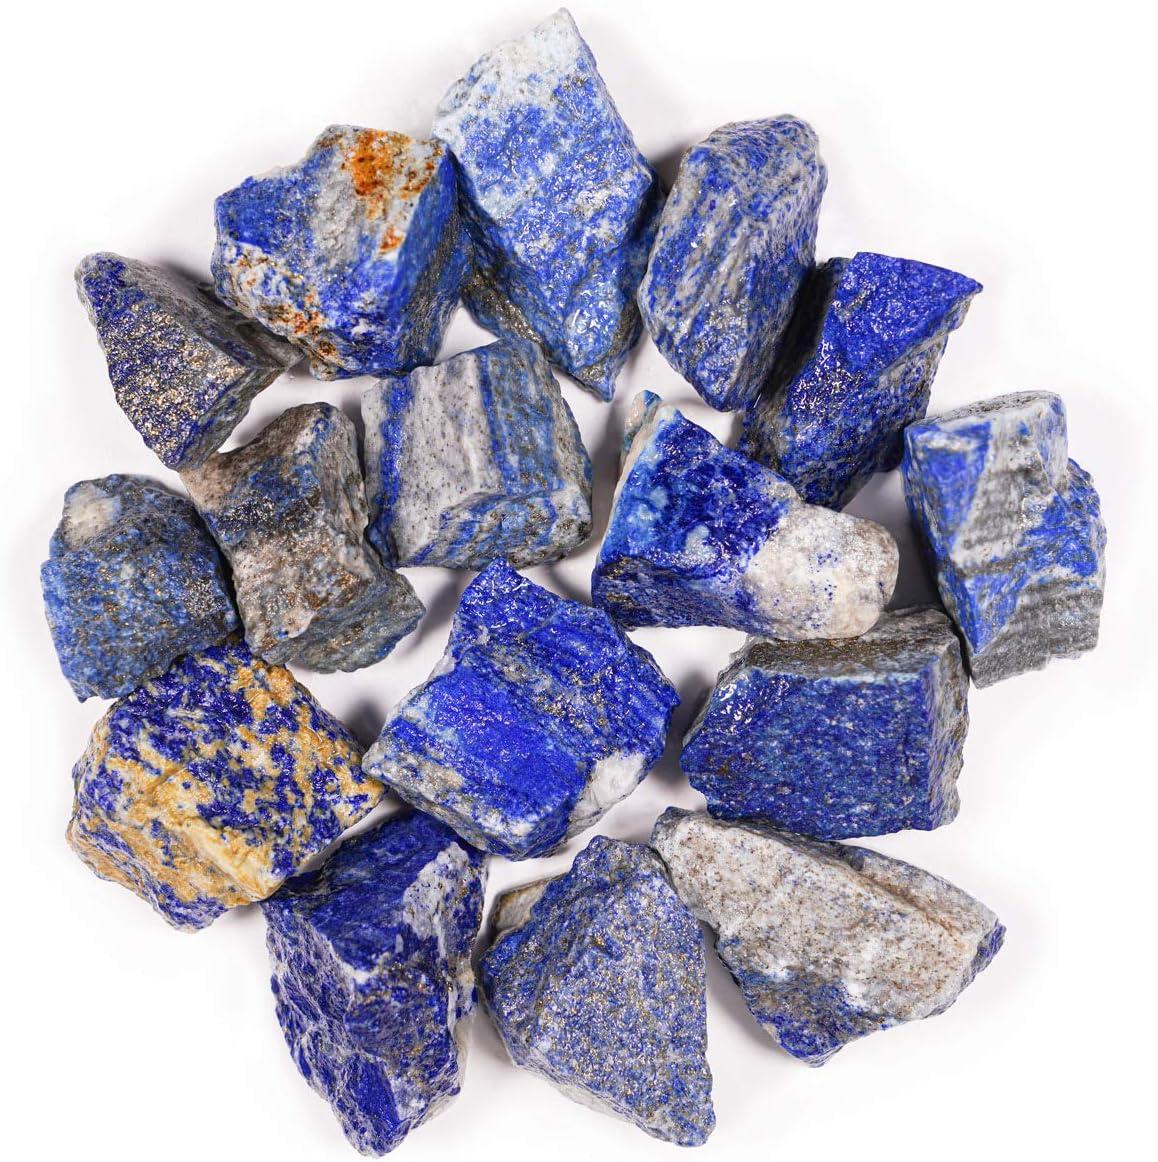 Lapis Lazuli Rock Crystal Doublet Cabochon-Lapis Crystal Doublet-Natural Lapis Crystal Faceted Rectangle Cabochon-29x13.5x3.5 MM-BS16657